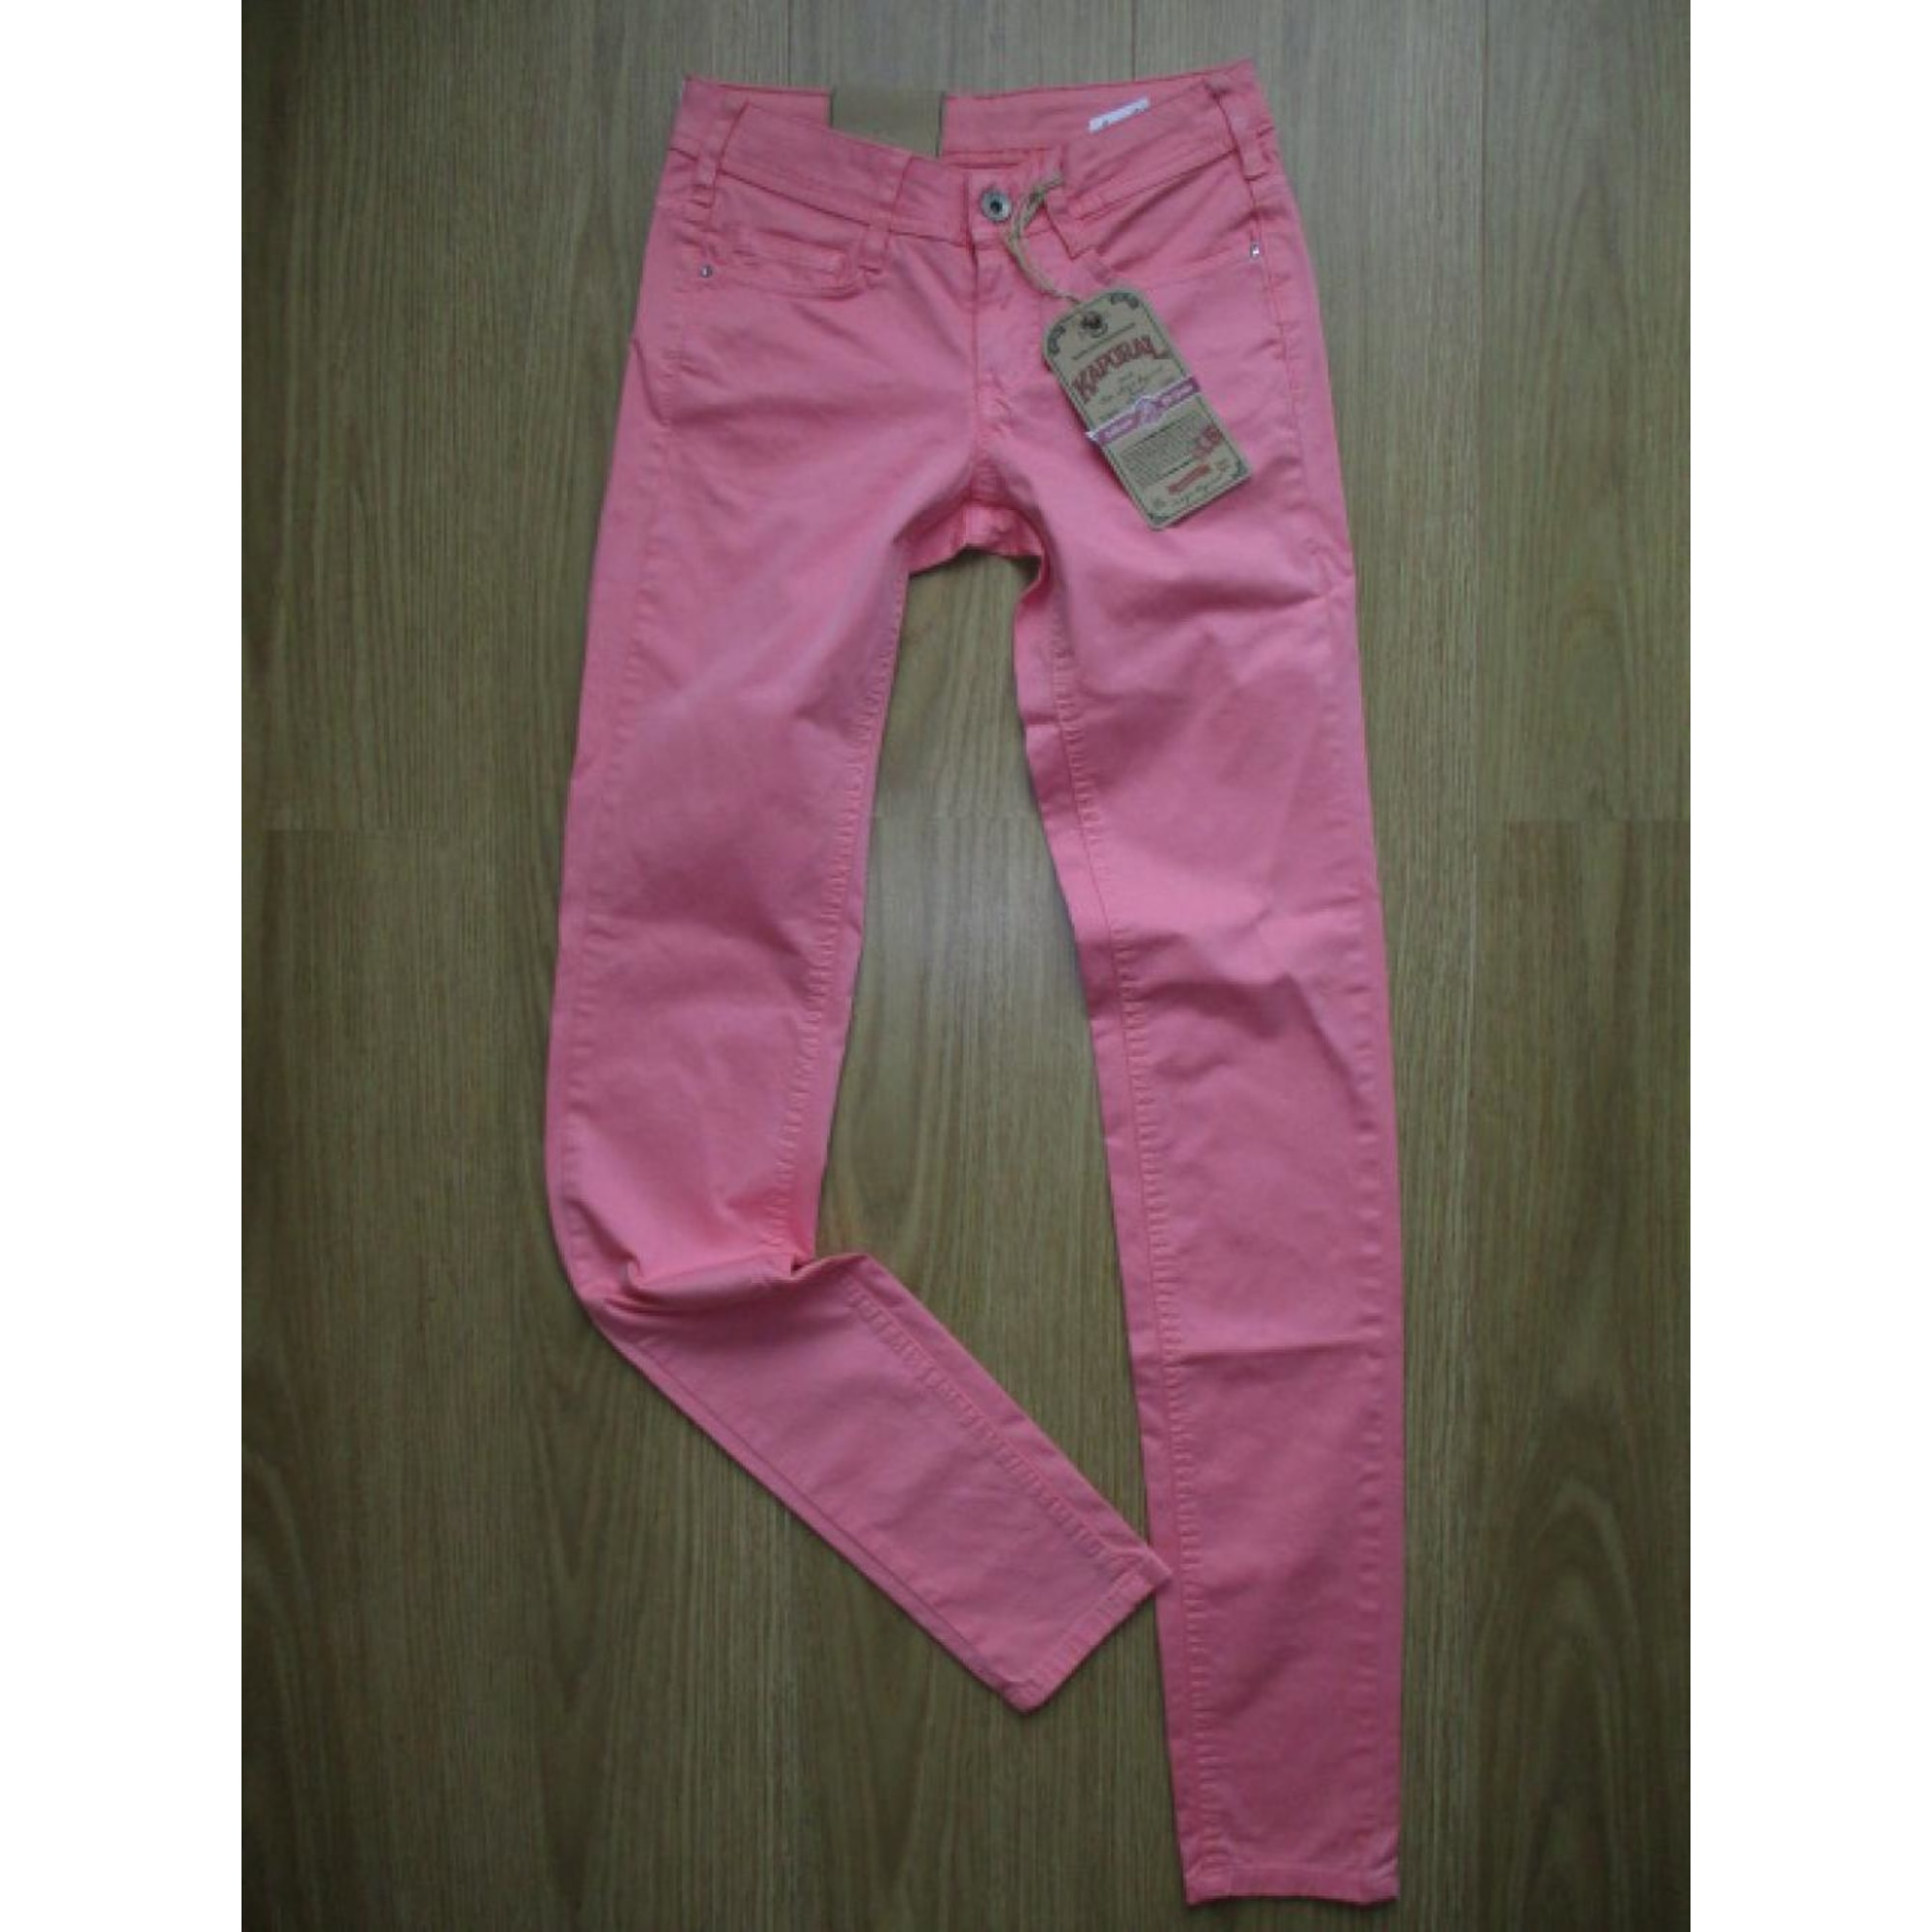 Jeans slim KAPORAL Rose, fuschia, vieux rose